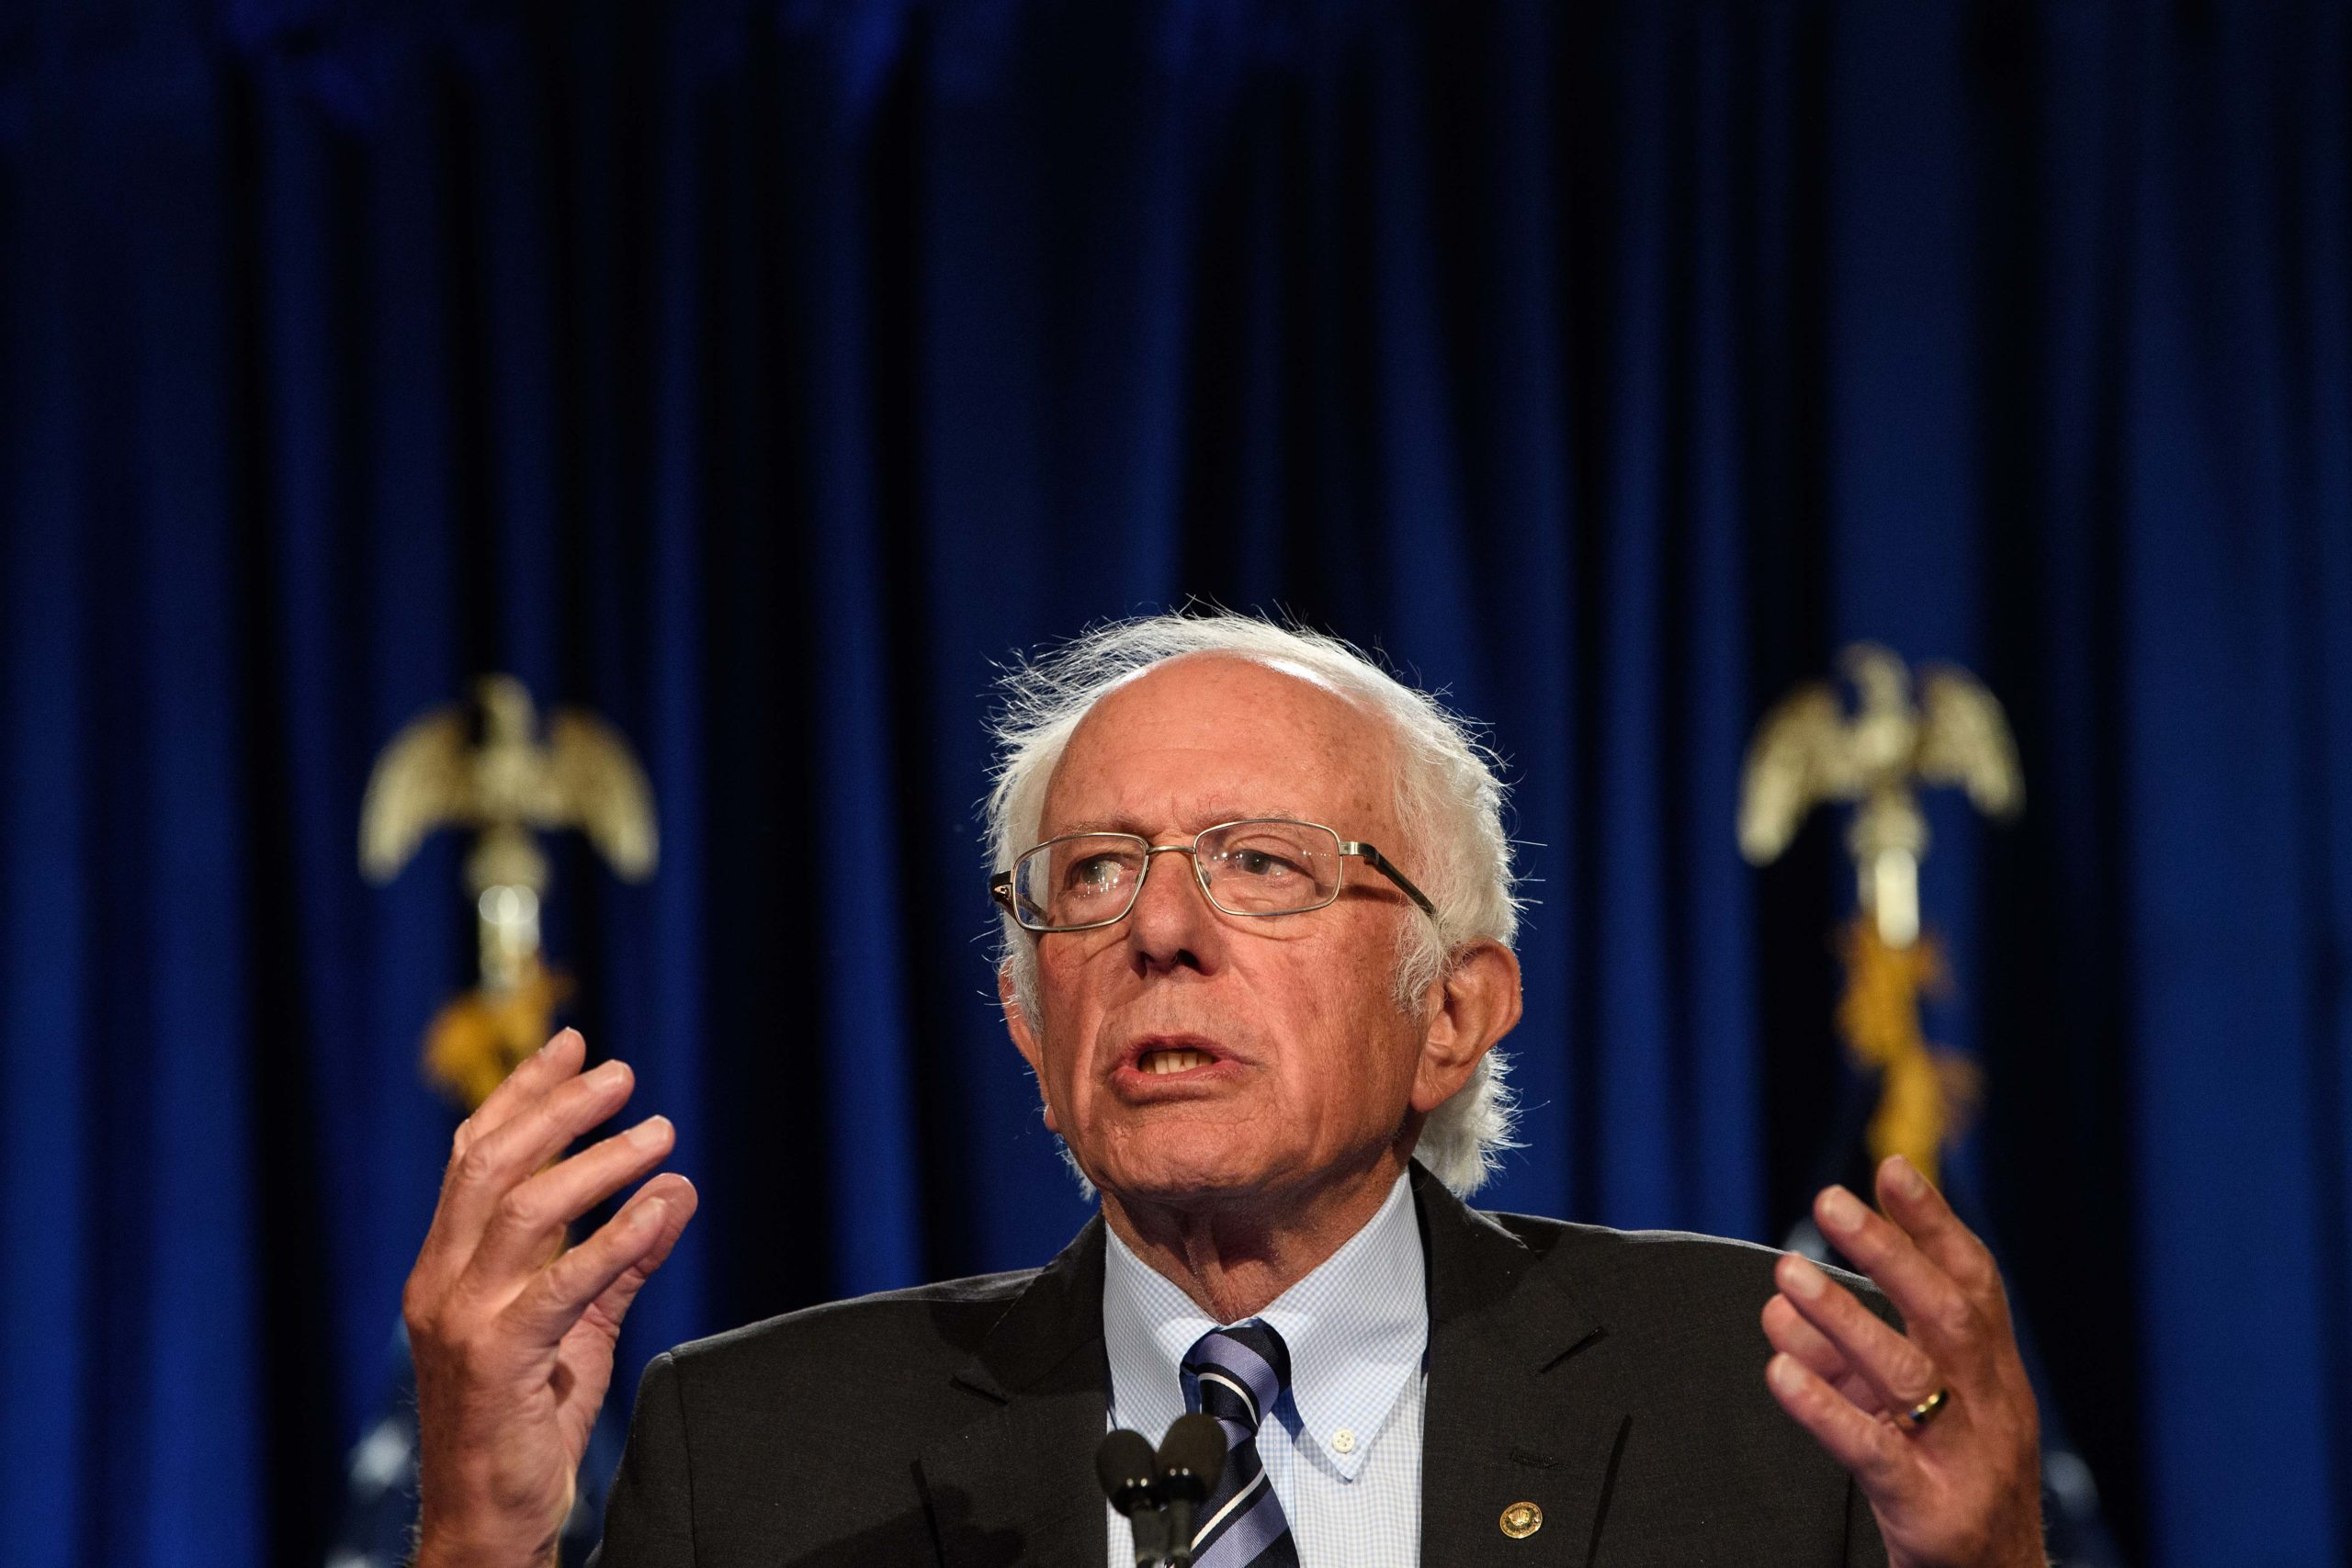 Sen. Bernie Sanders speaks at George Washington University in Washington, DC, on Sept. 24. (Nicholas Kamm/AFP via Getty Images)